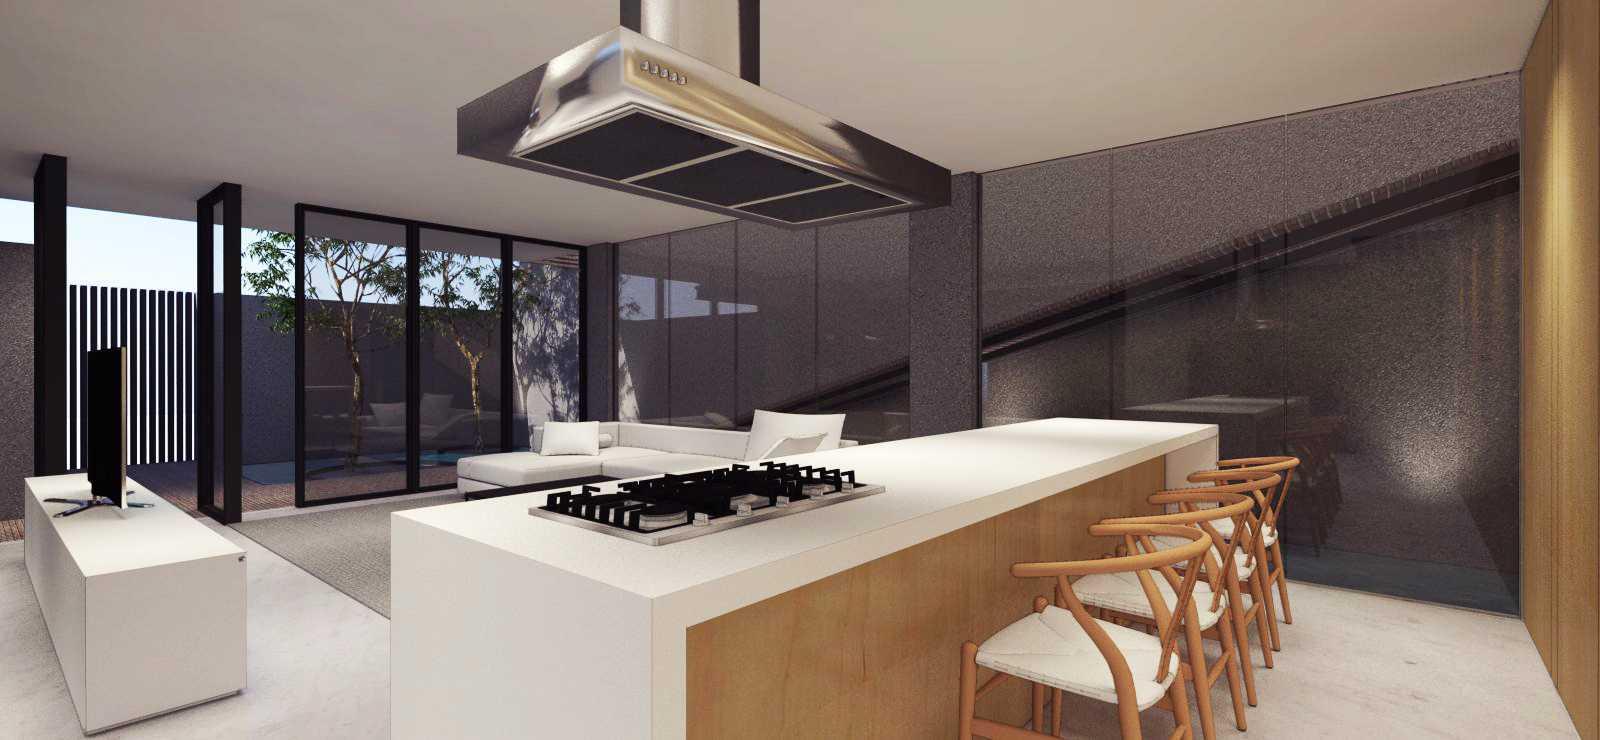 Ari Wibowo Design (Aw.d) Sn House Banten Banten Kitchen Modern  14531